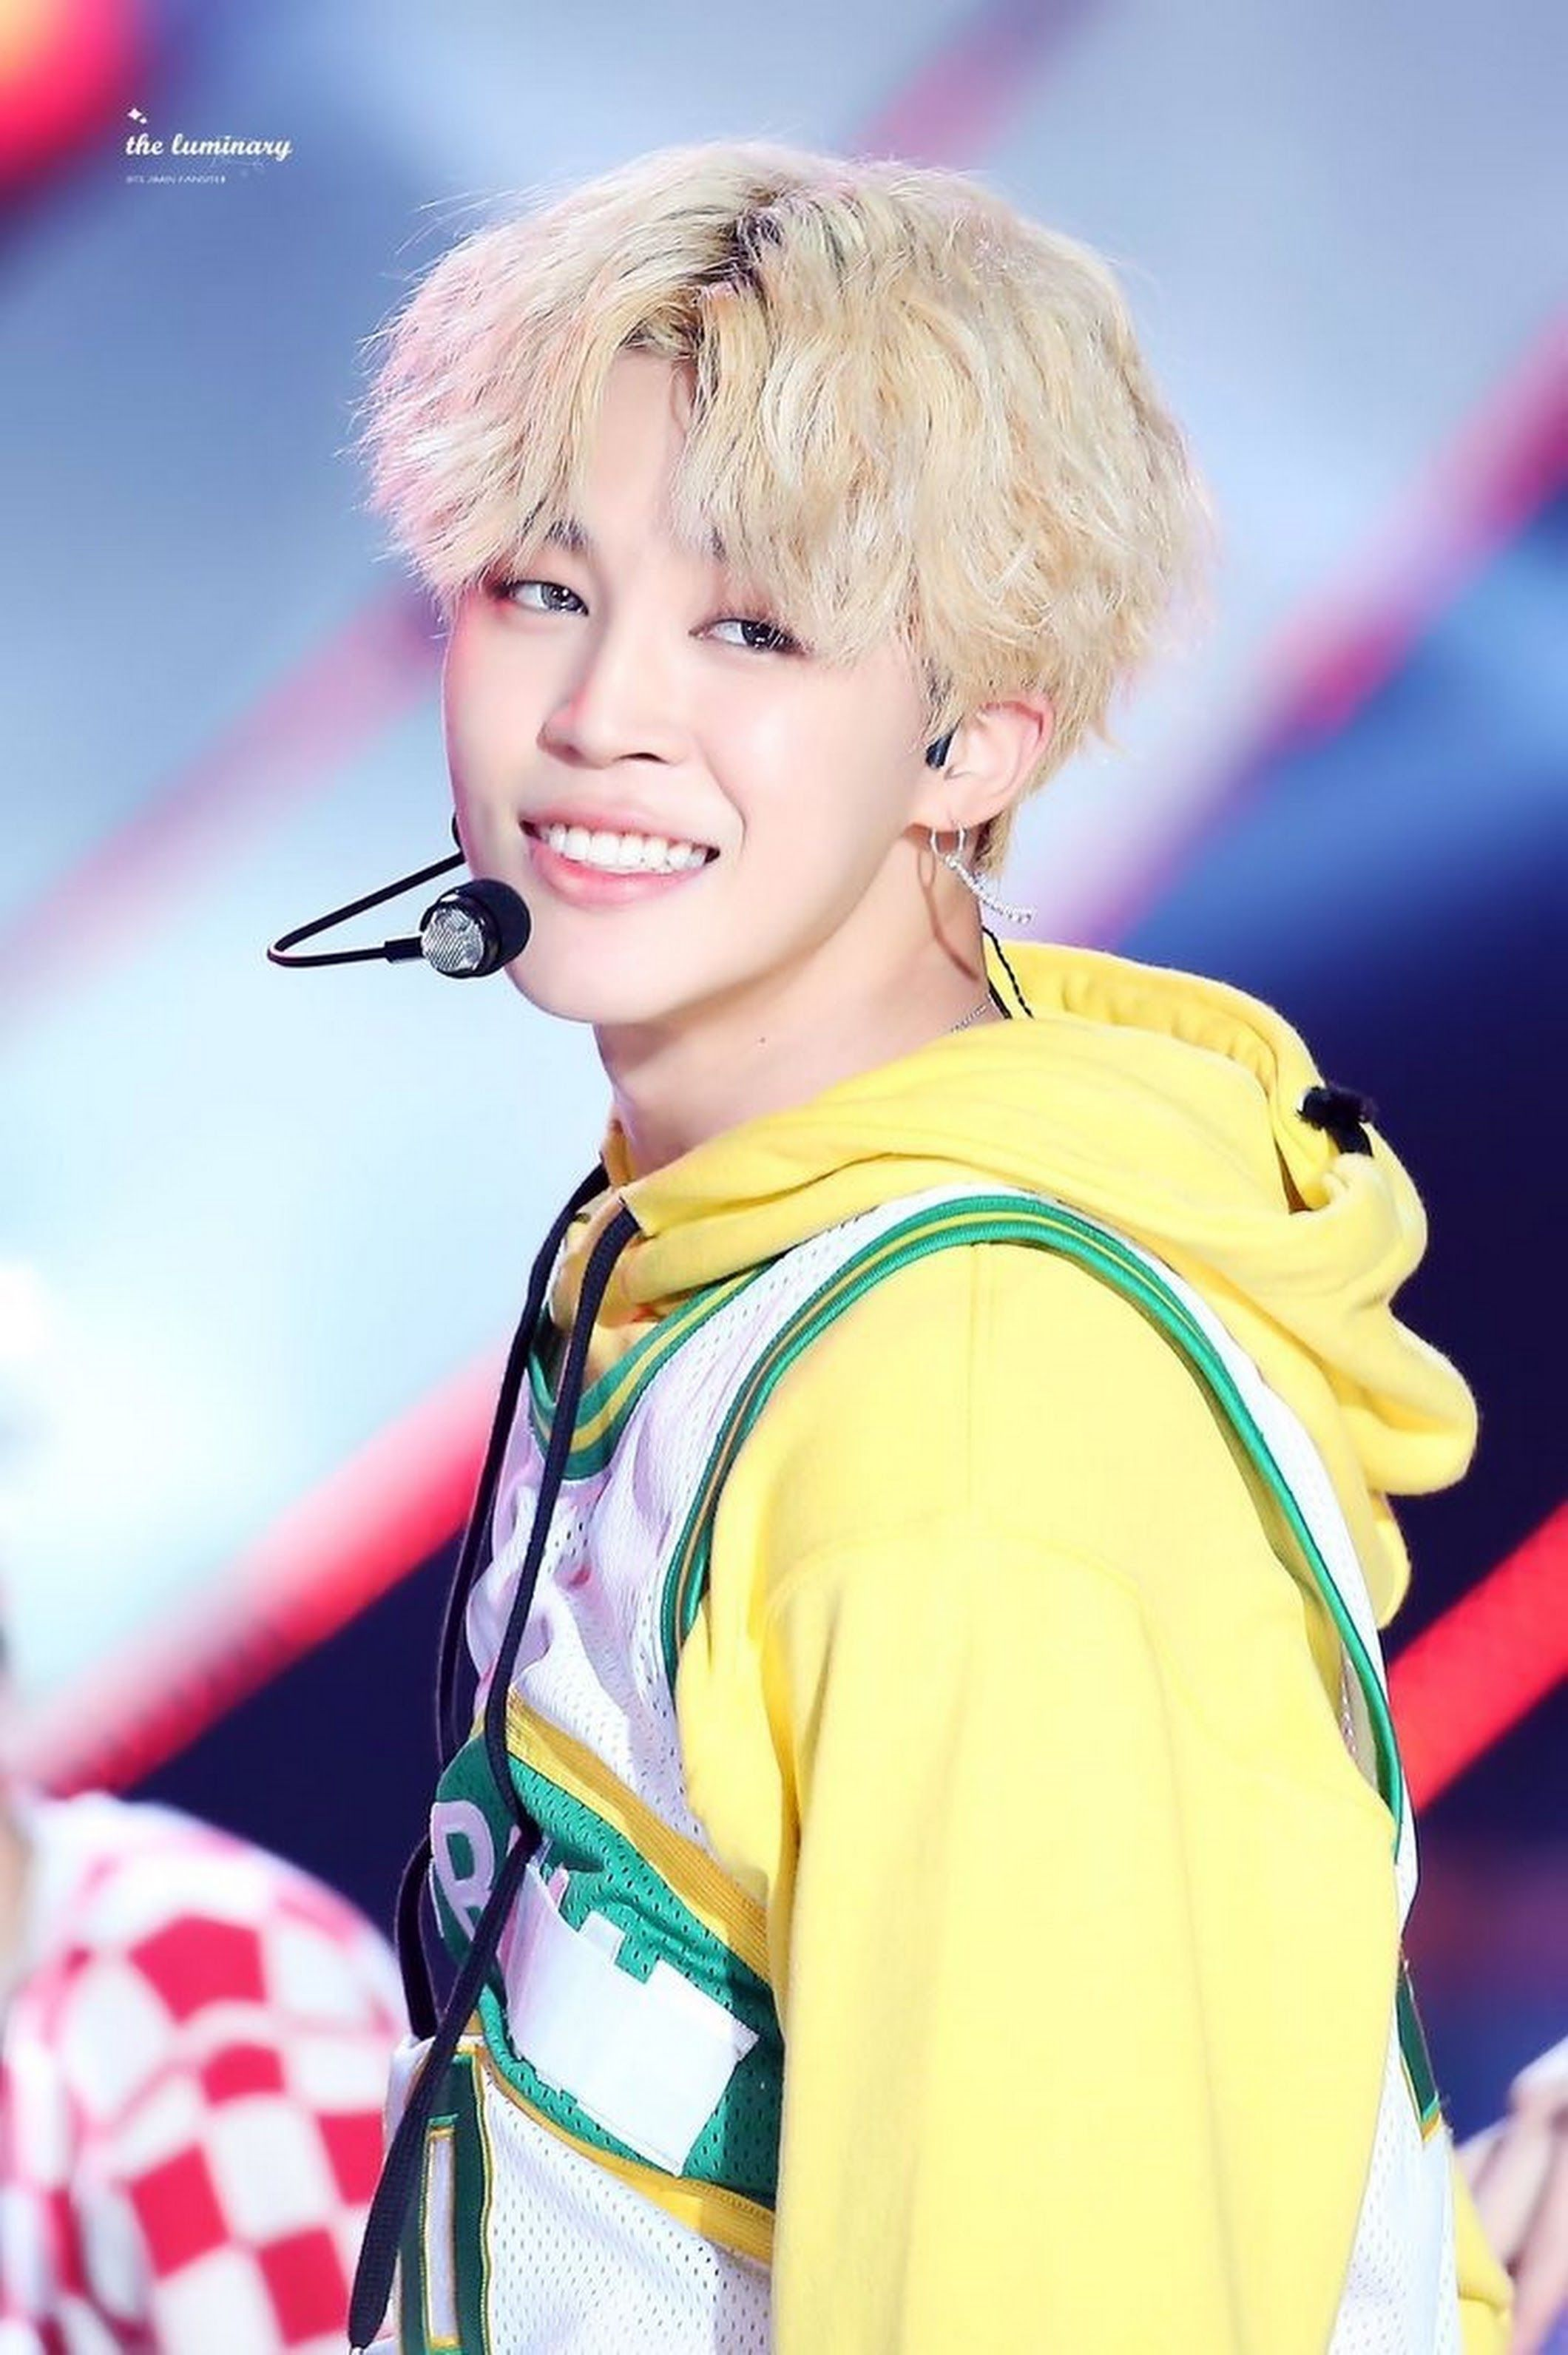 His Eyes The Way He Smiles Bts Jimin Jimin Park